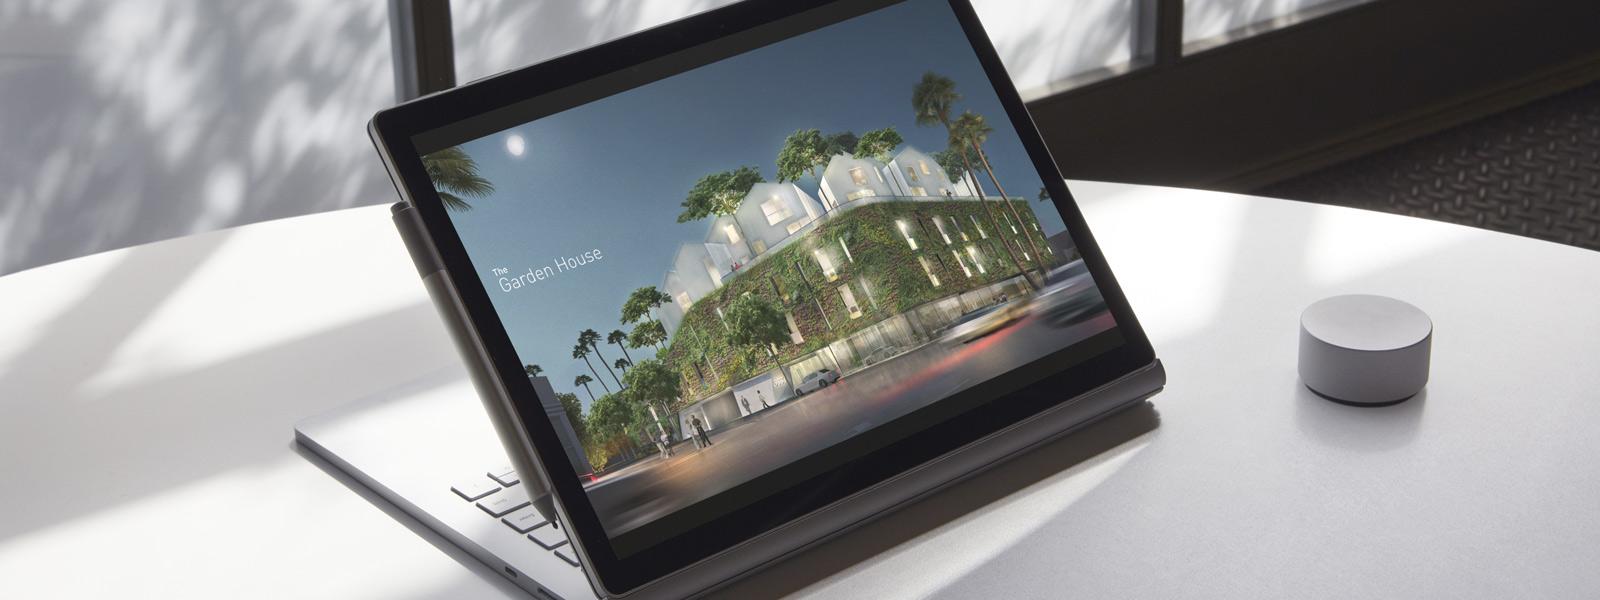 Surface Book 2 su un tavolo con la finestra